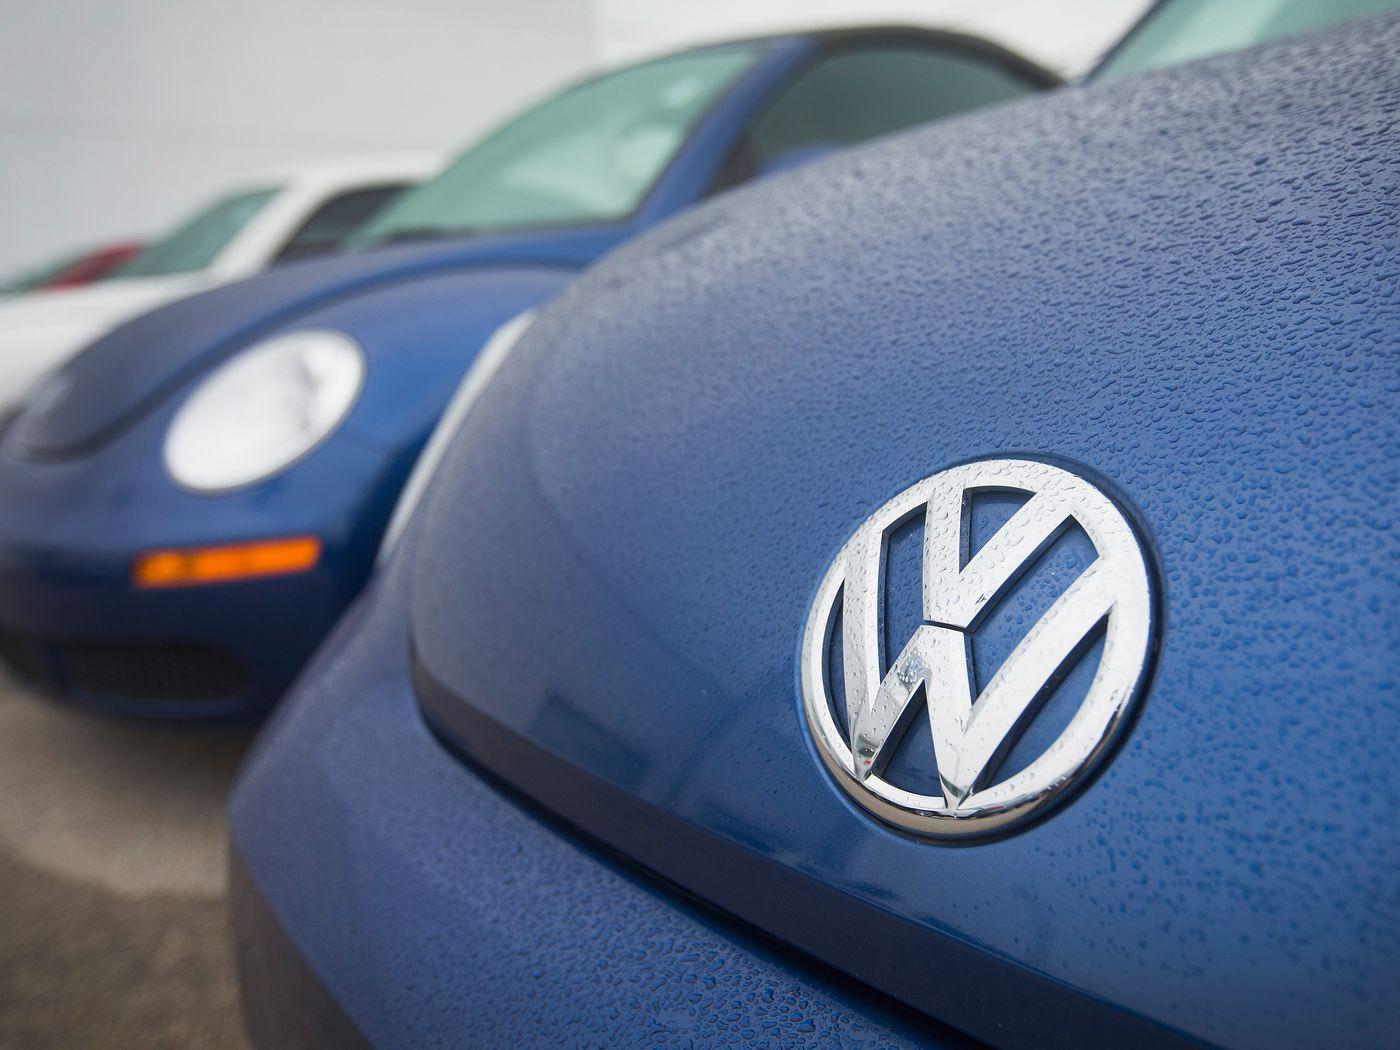 Volkswagen's appalling clean diesel scandal, explained - Vox